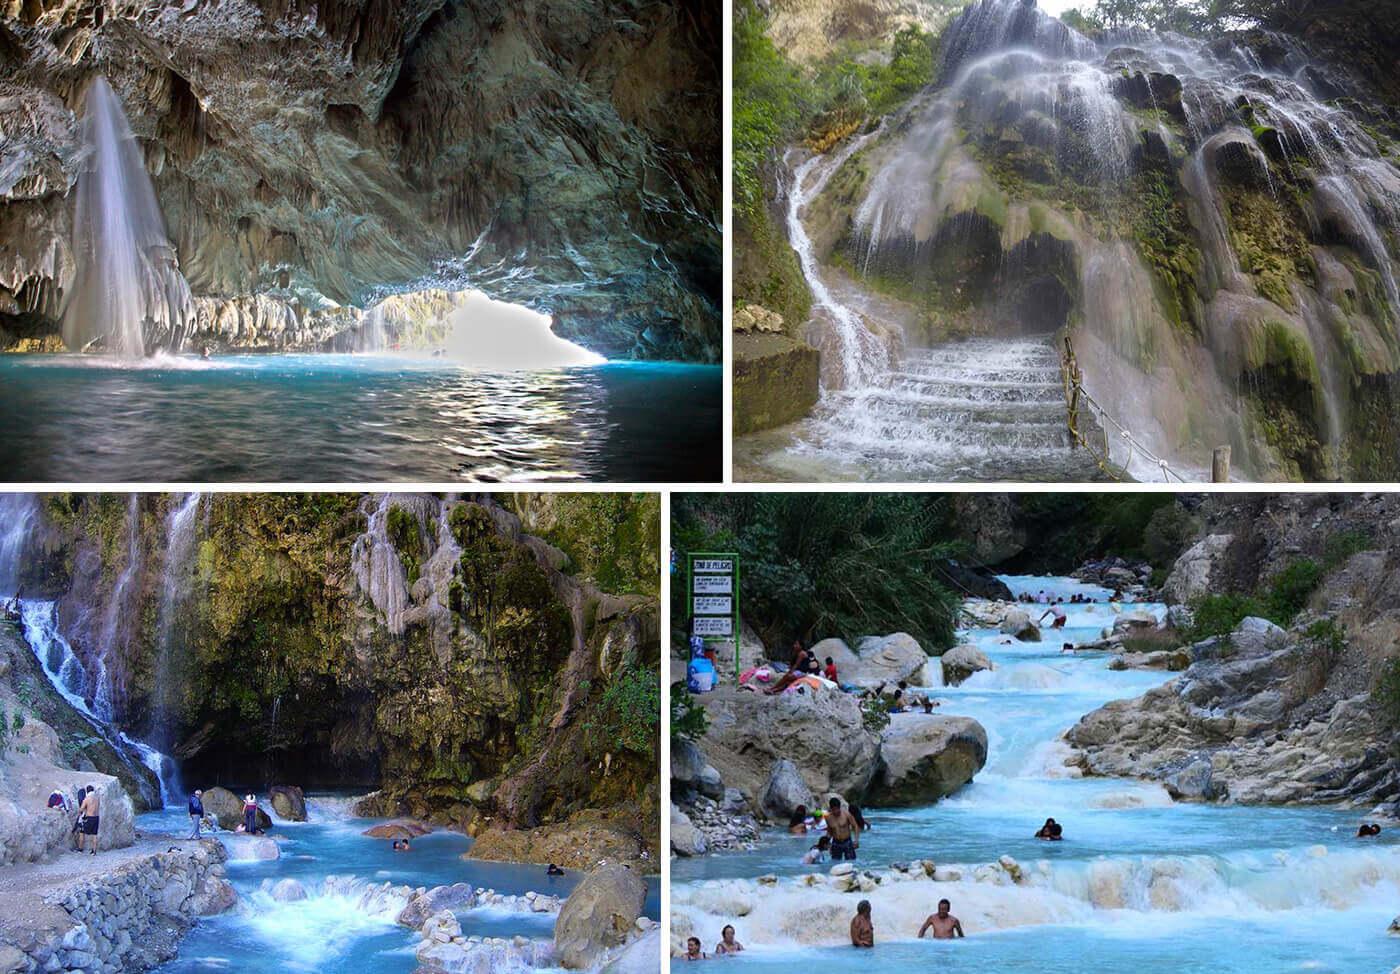 Grutas-de-Tolantongo-Hildago-Messico